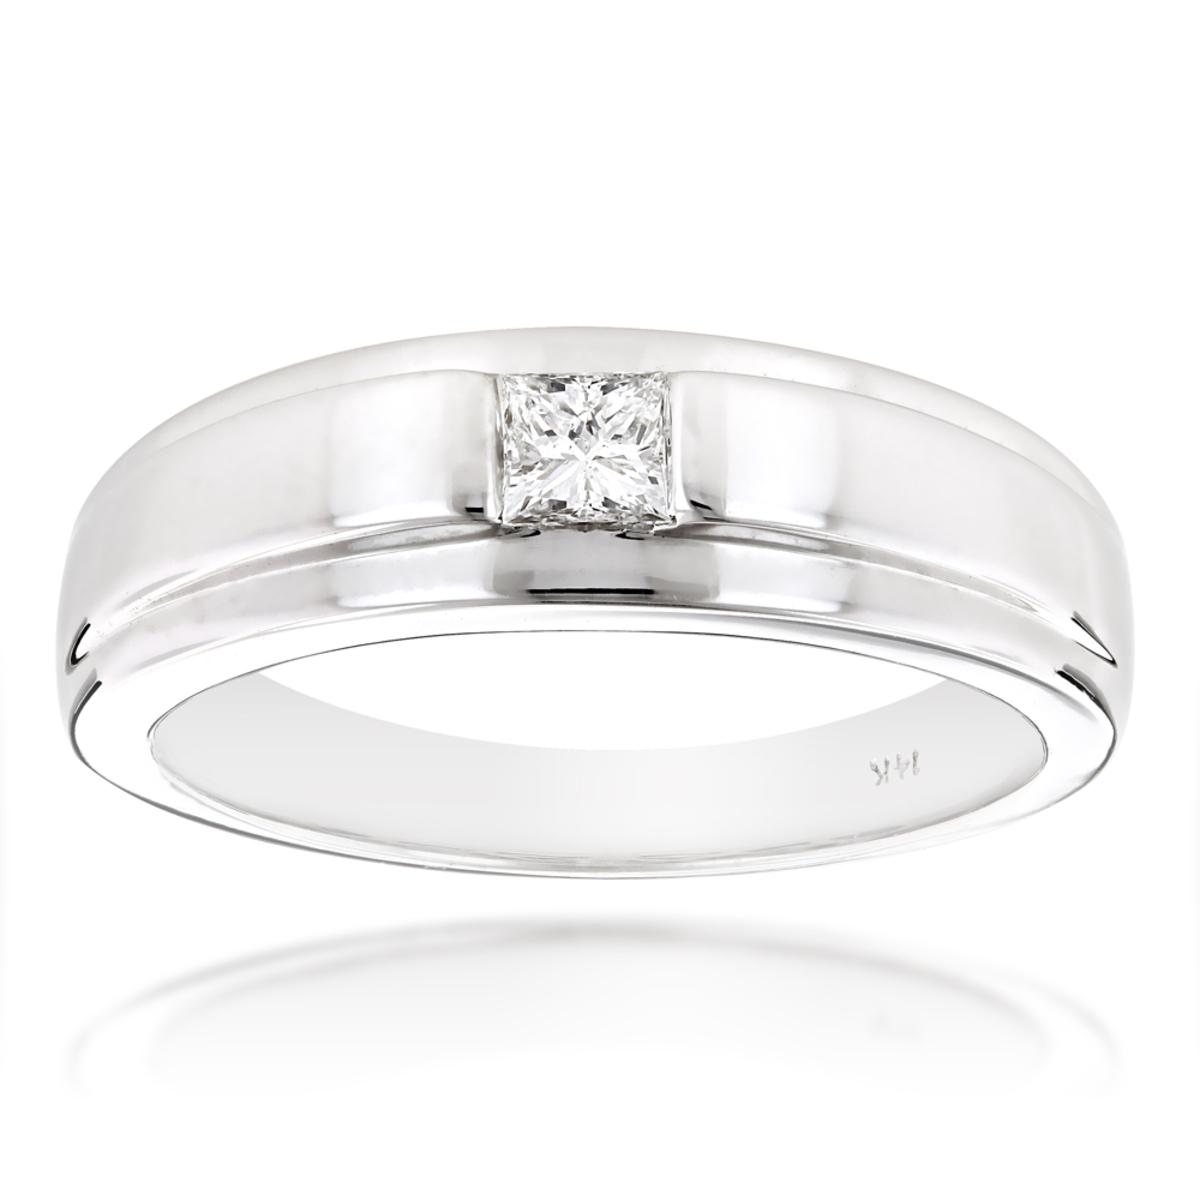 Solitaire 14K Gold Princess Cut Diamond Wedding Band 0.25ct